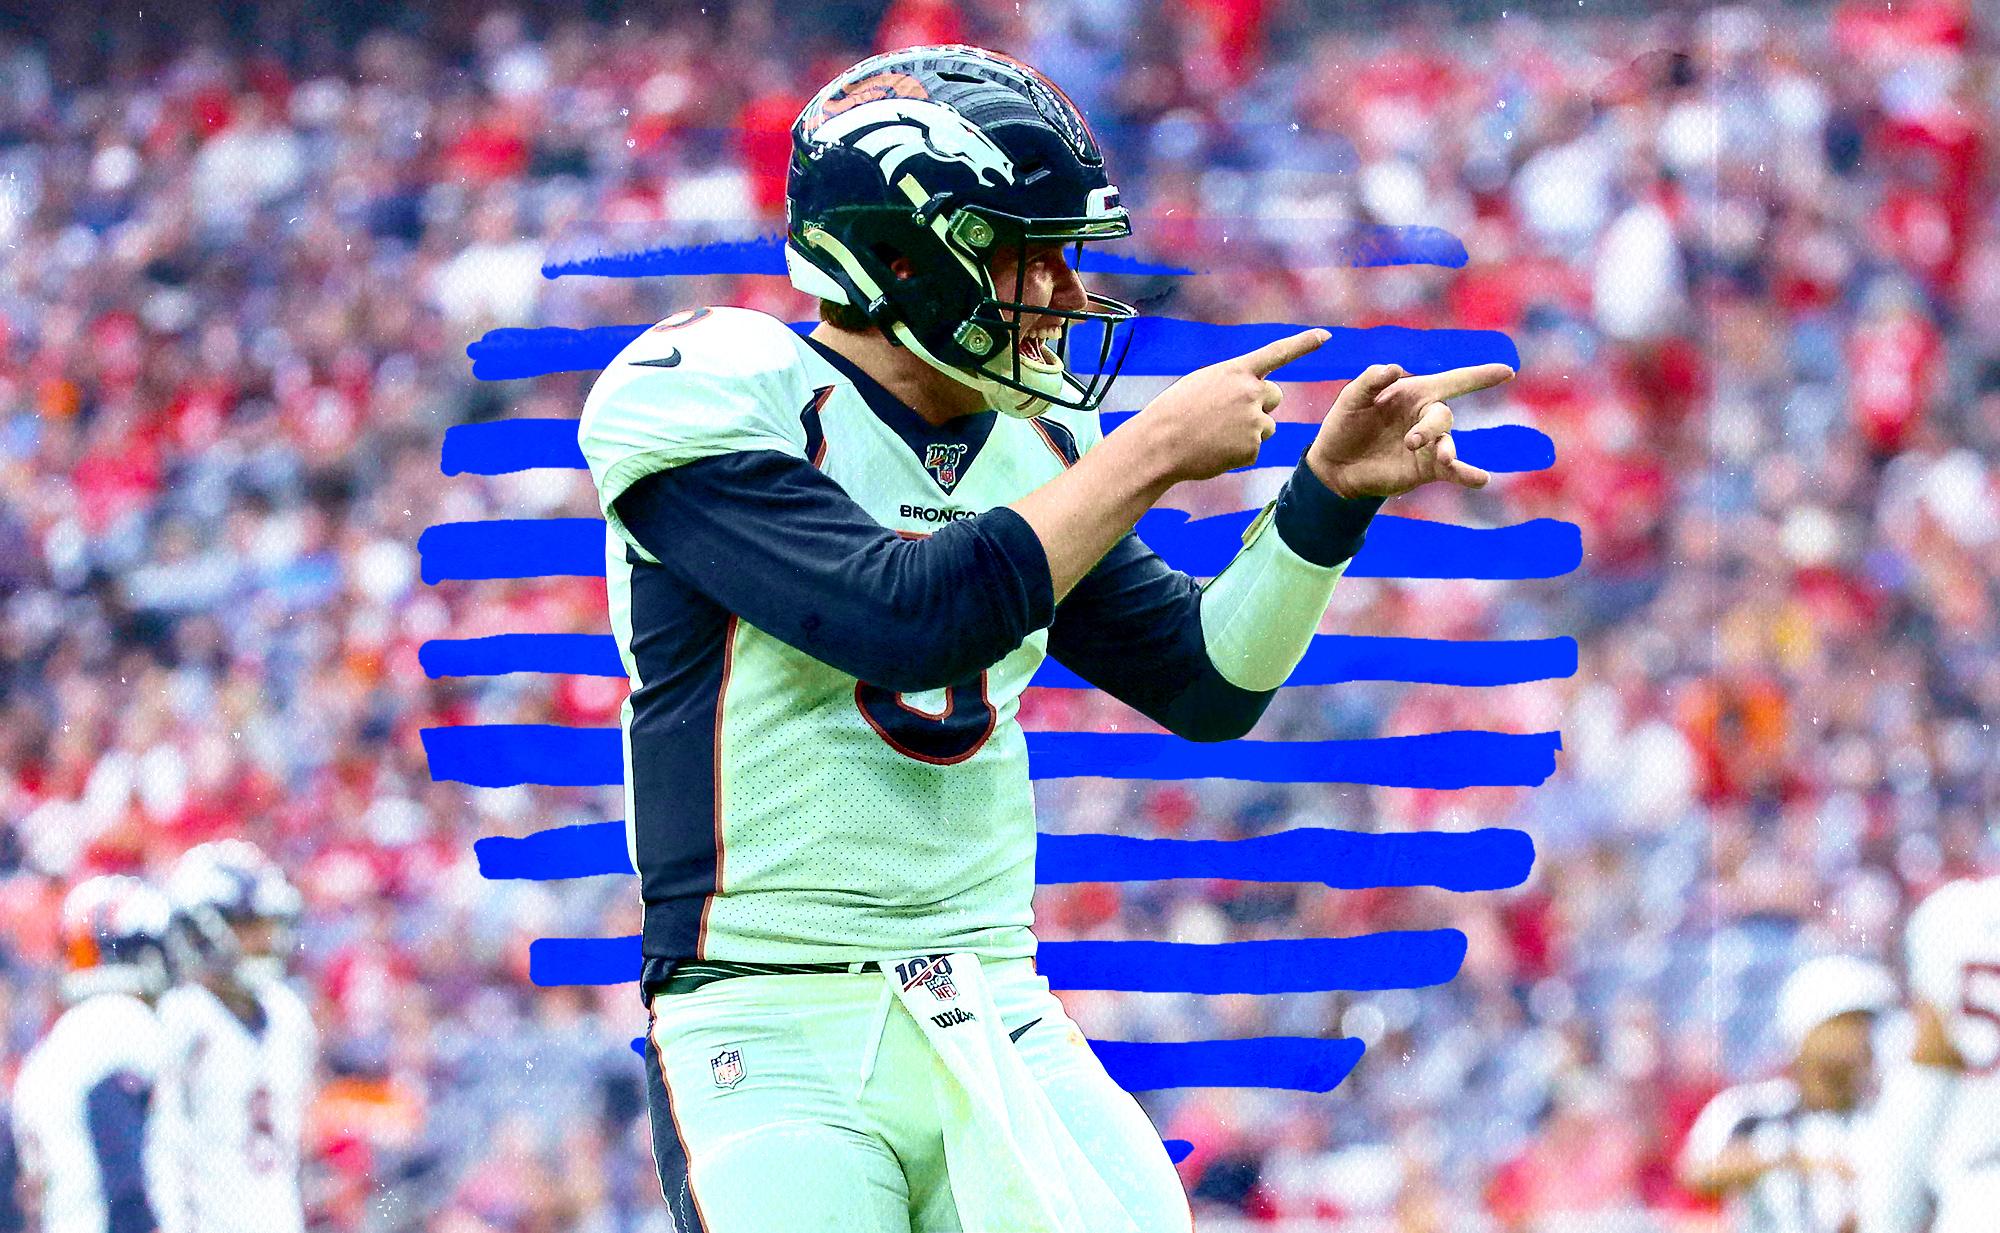 Broncos QB Drew Lock celebrating a touchdown pass thrown against the Texans